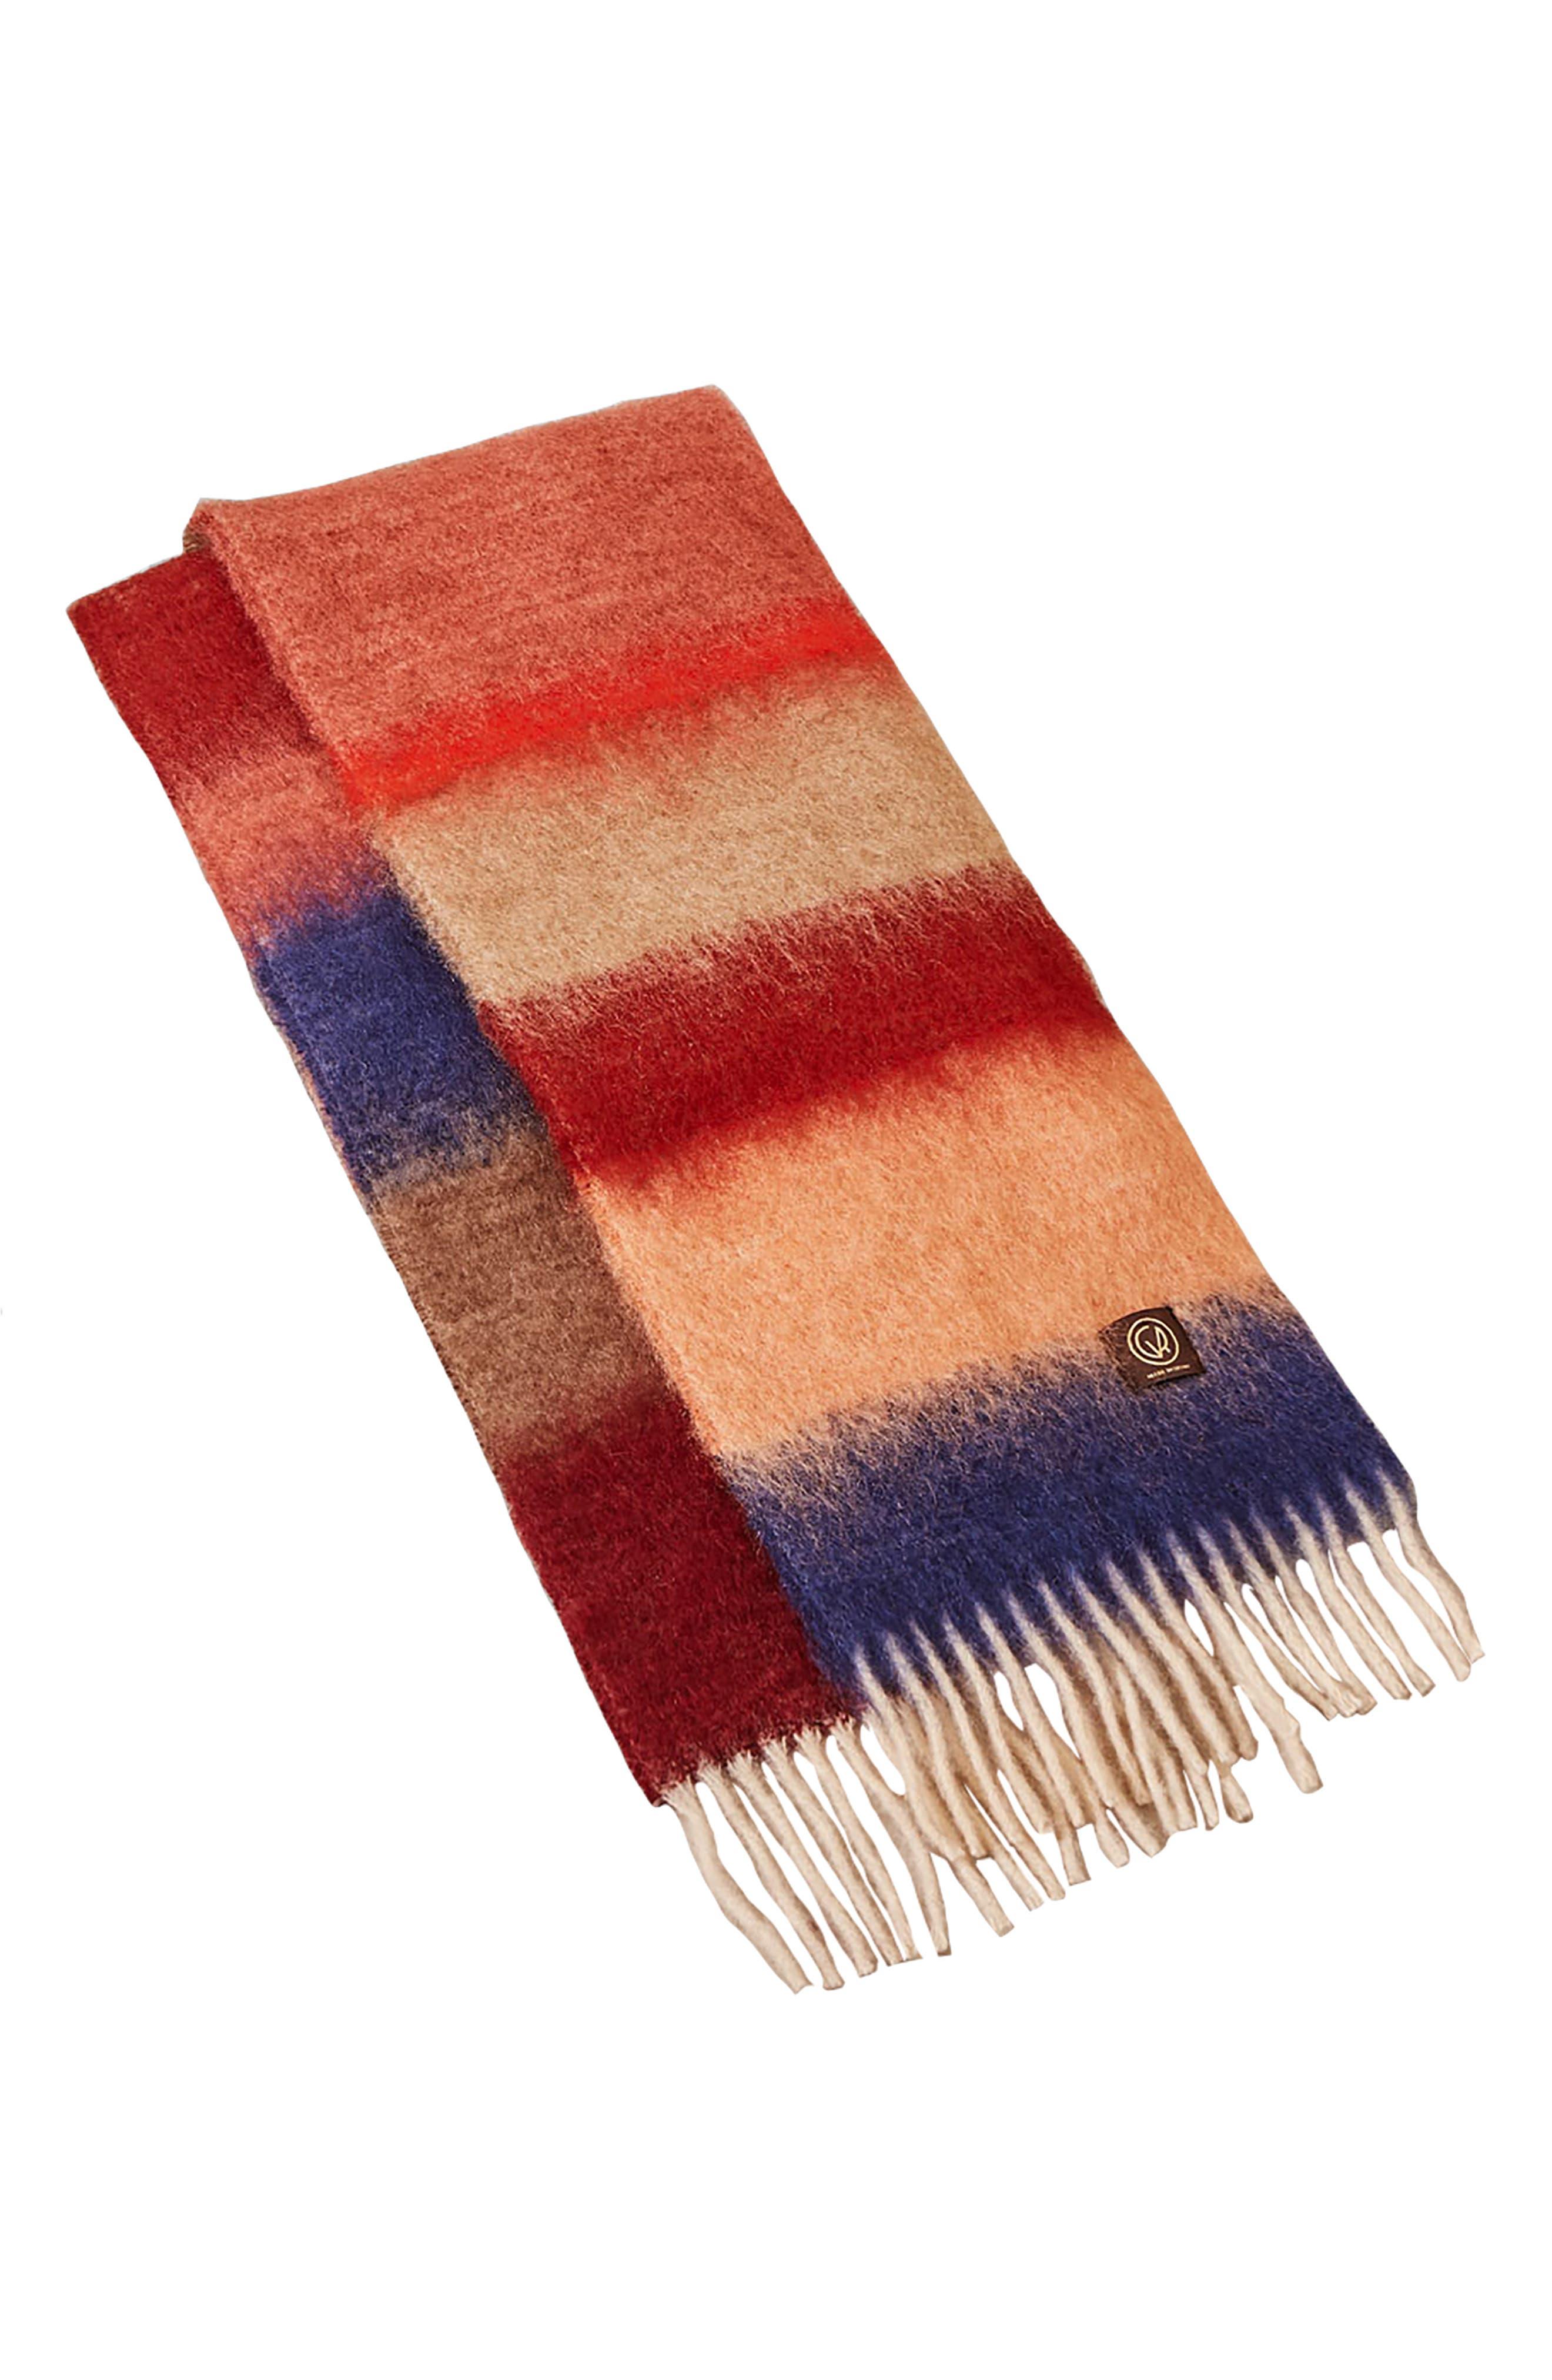 X Ezcaray Matisse Mohair & Wool Scarf